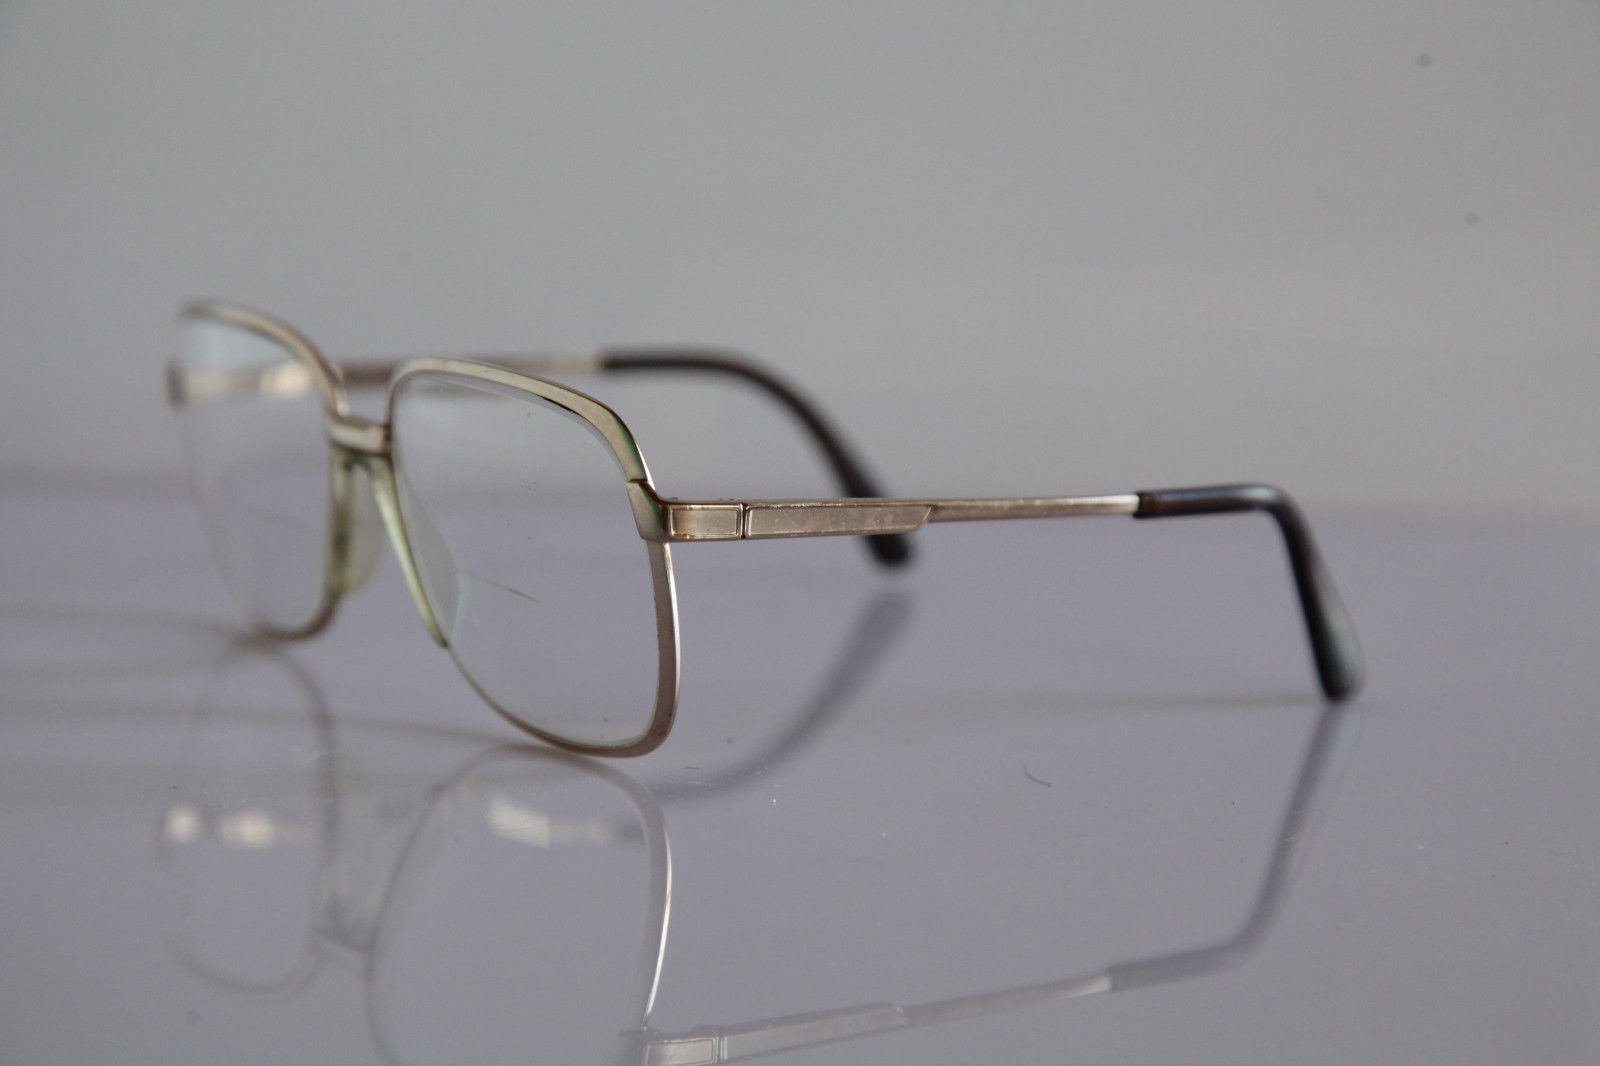 RODENSTOCK GP Eyewear, RODAFLEX, Gold Plated Frame,  RX-Able Prescription lens.